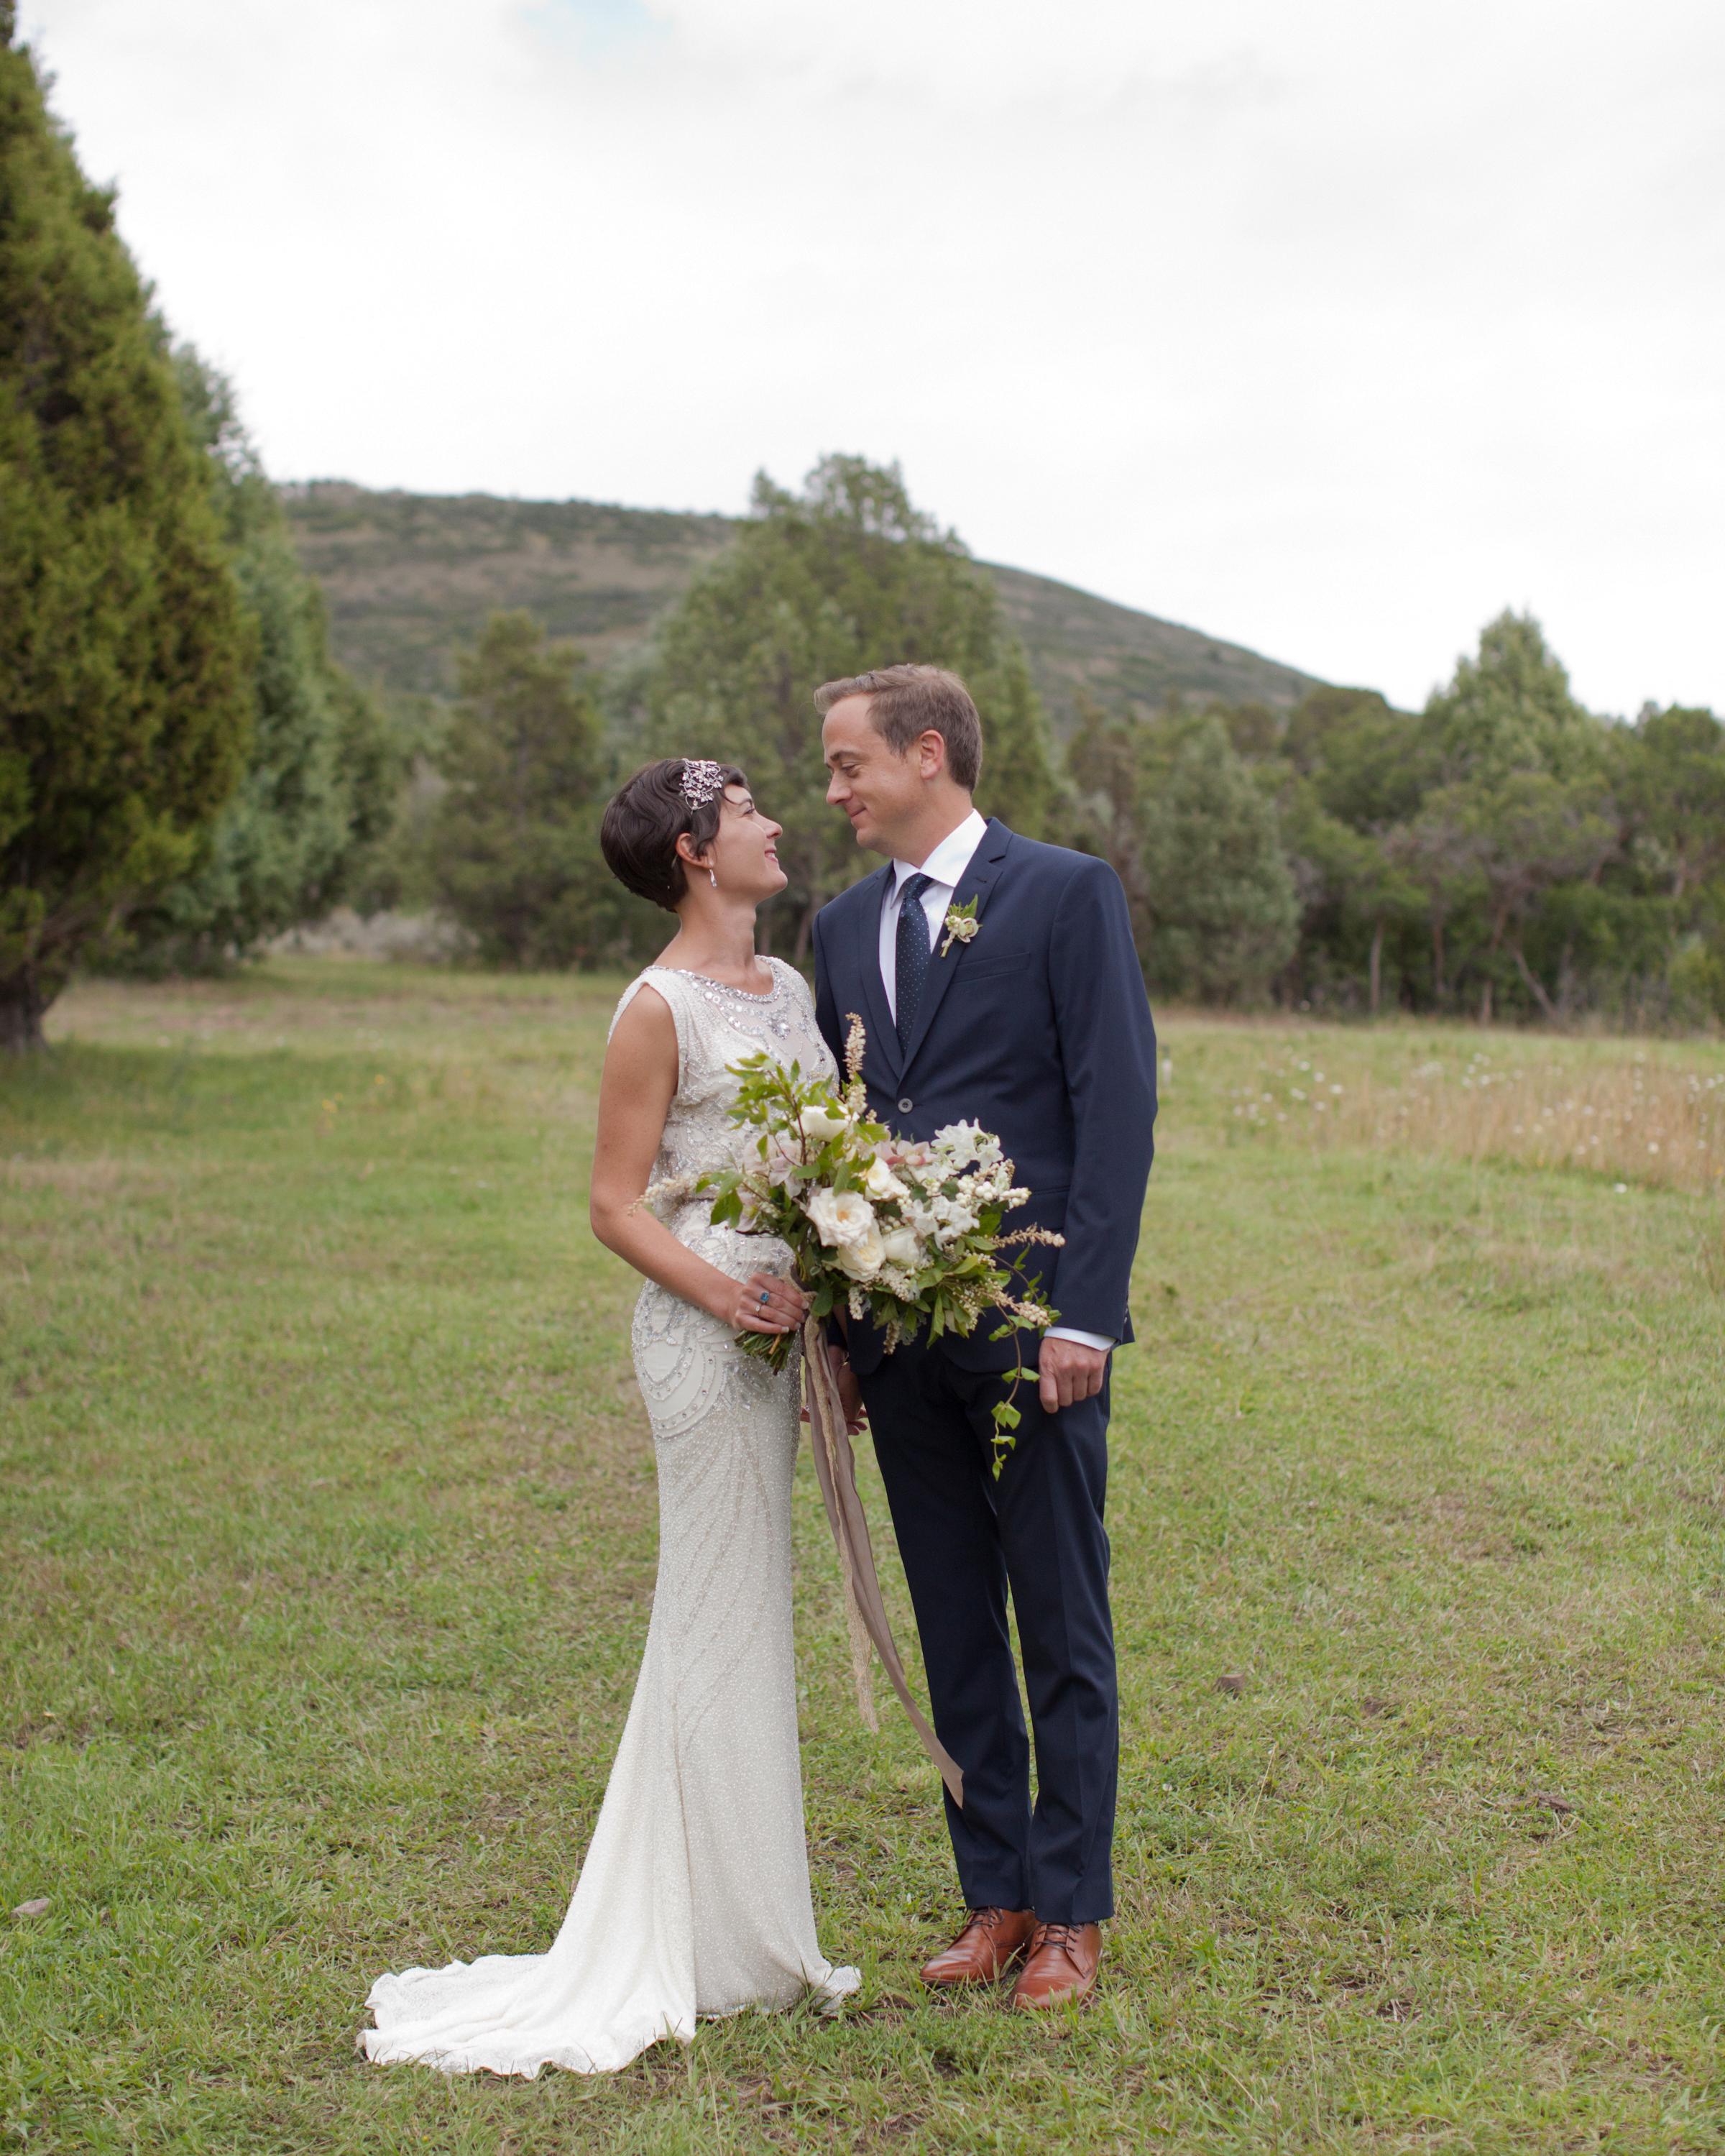 lizzy-pat-wedding-couple-055-s111777-0115.jpg